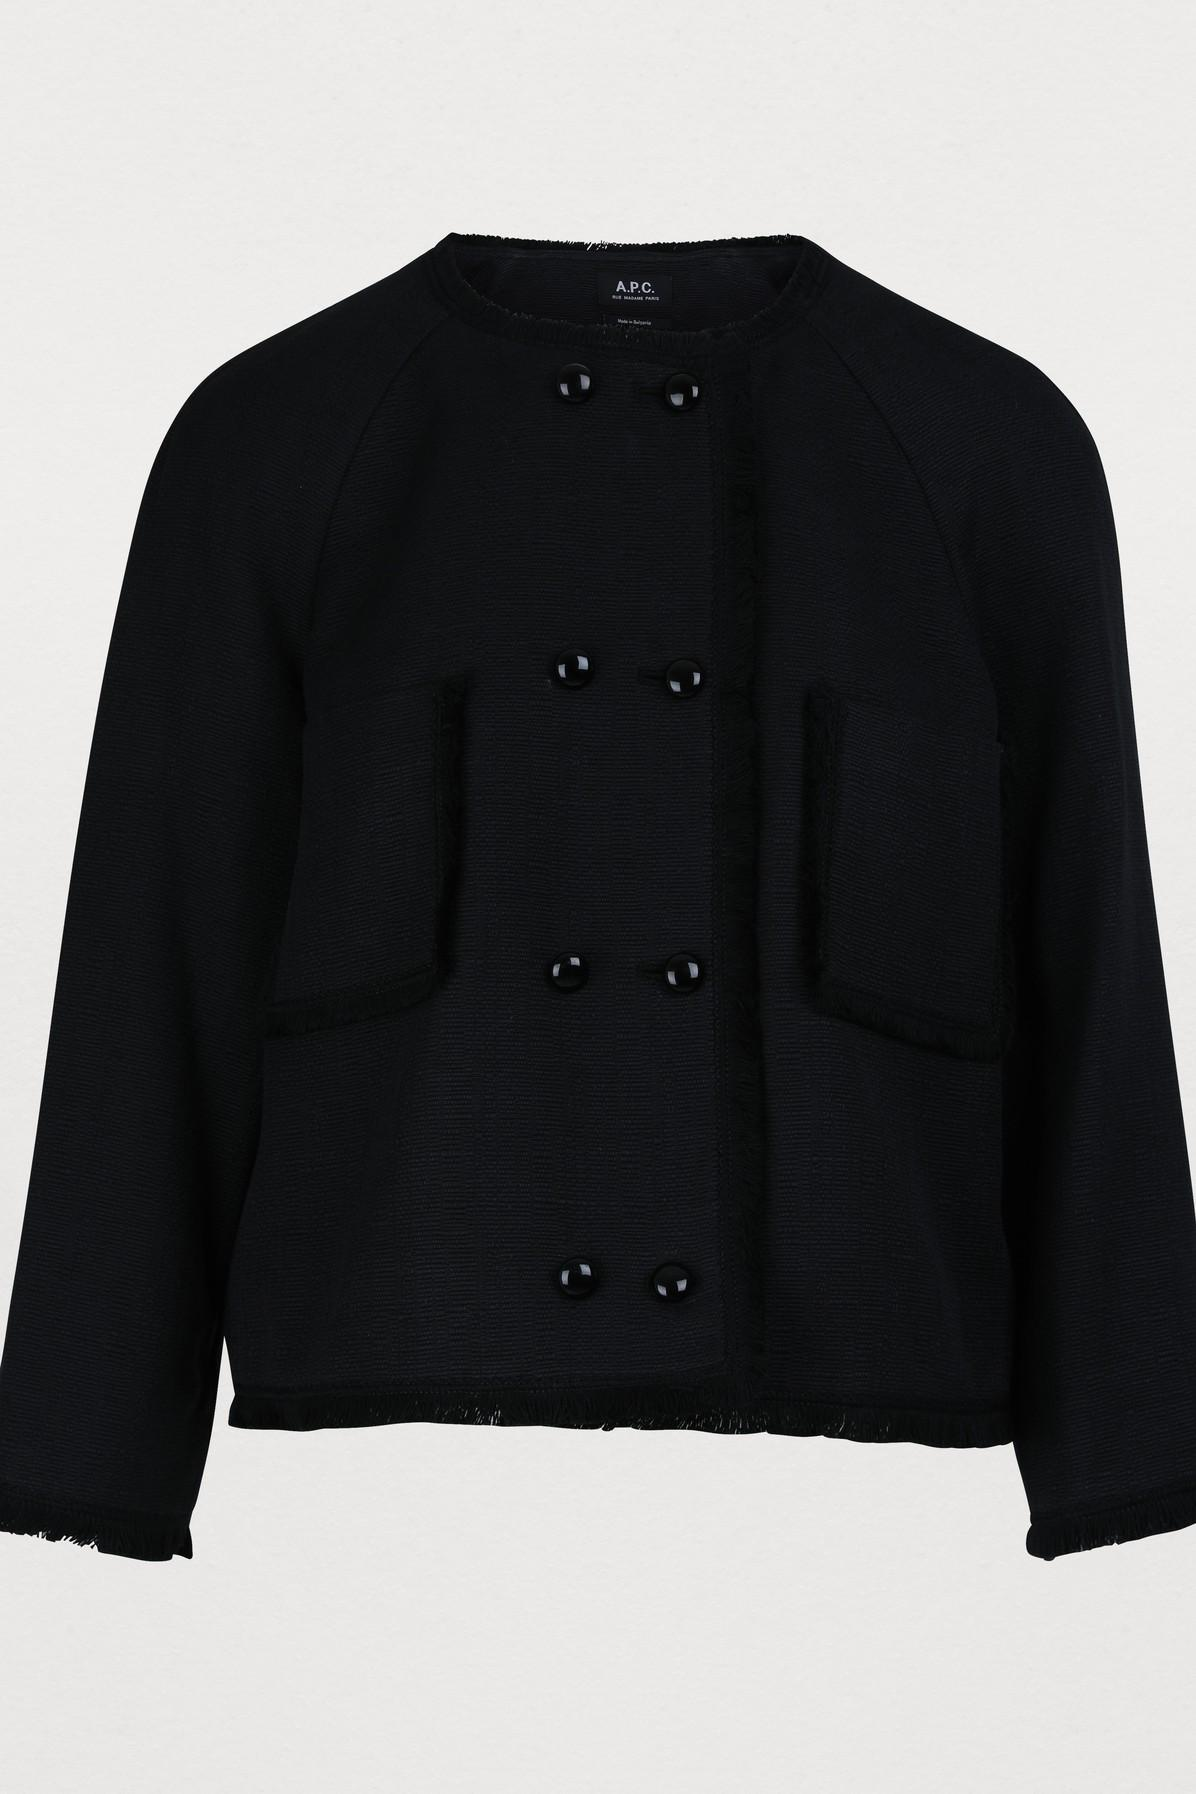 c1434c5e A.P.C. Fabiola Jacket in Black - Lyst